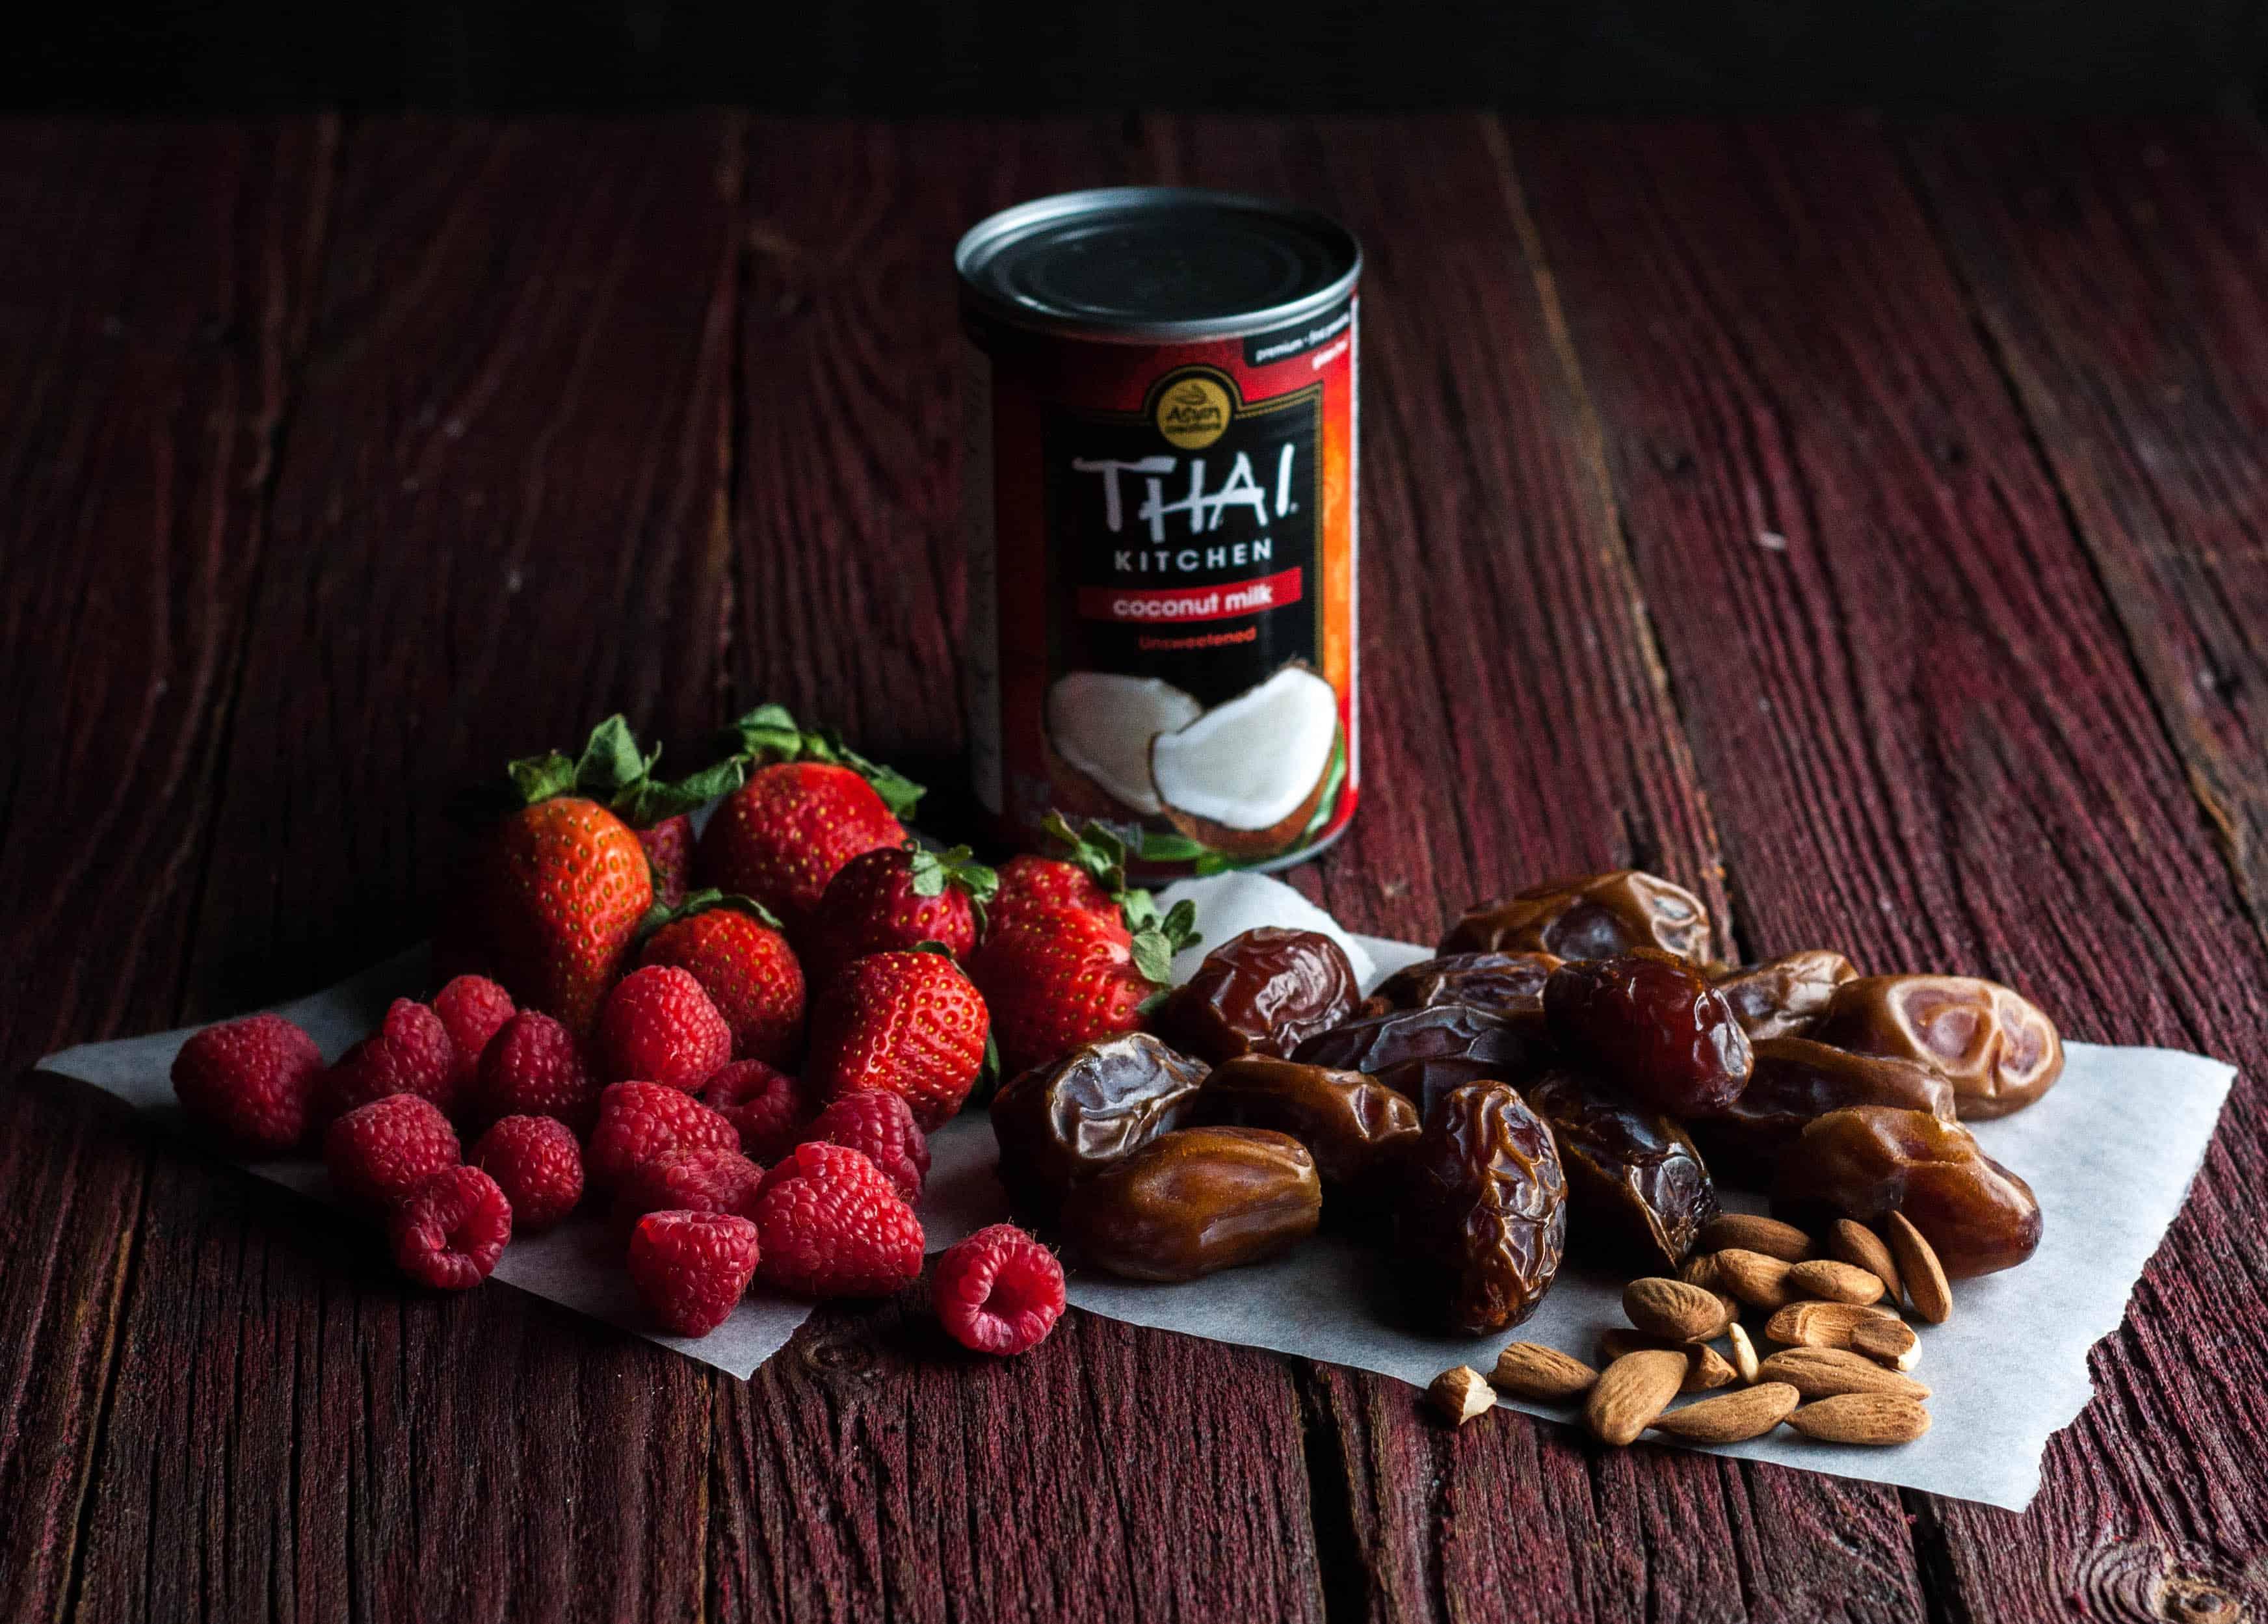 Ingredients used to make coconut cream fruit tarts